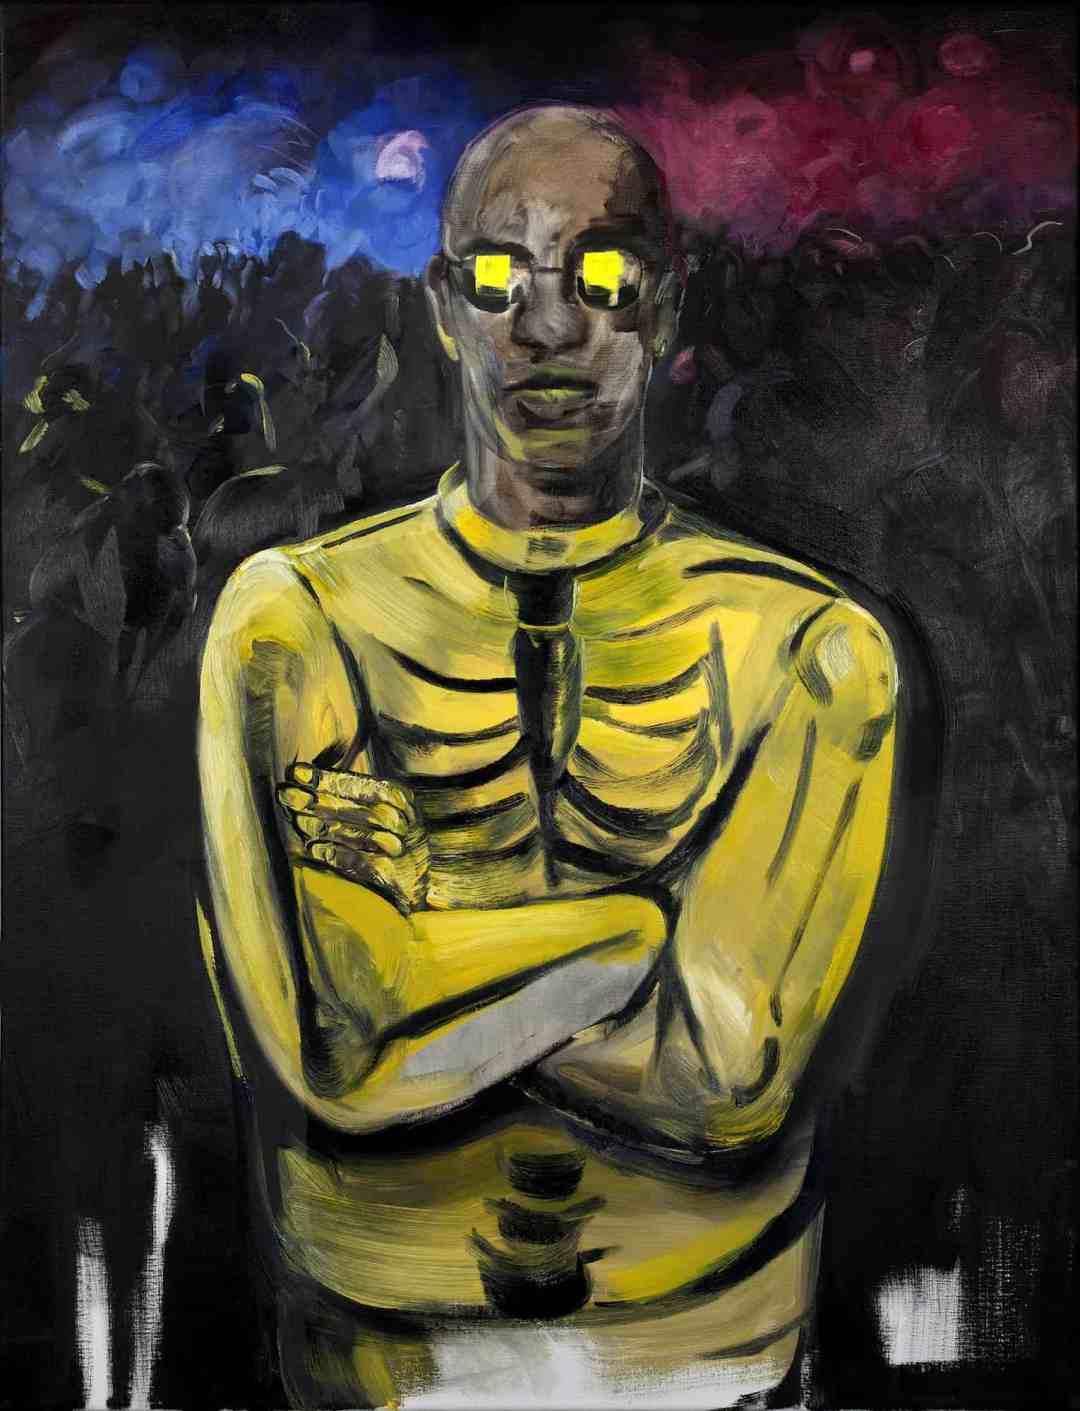 Pola Dwurnik, October, oil on canvas, 116x89cm